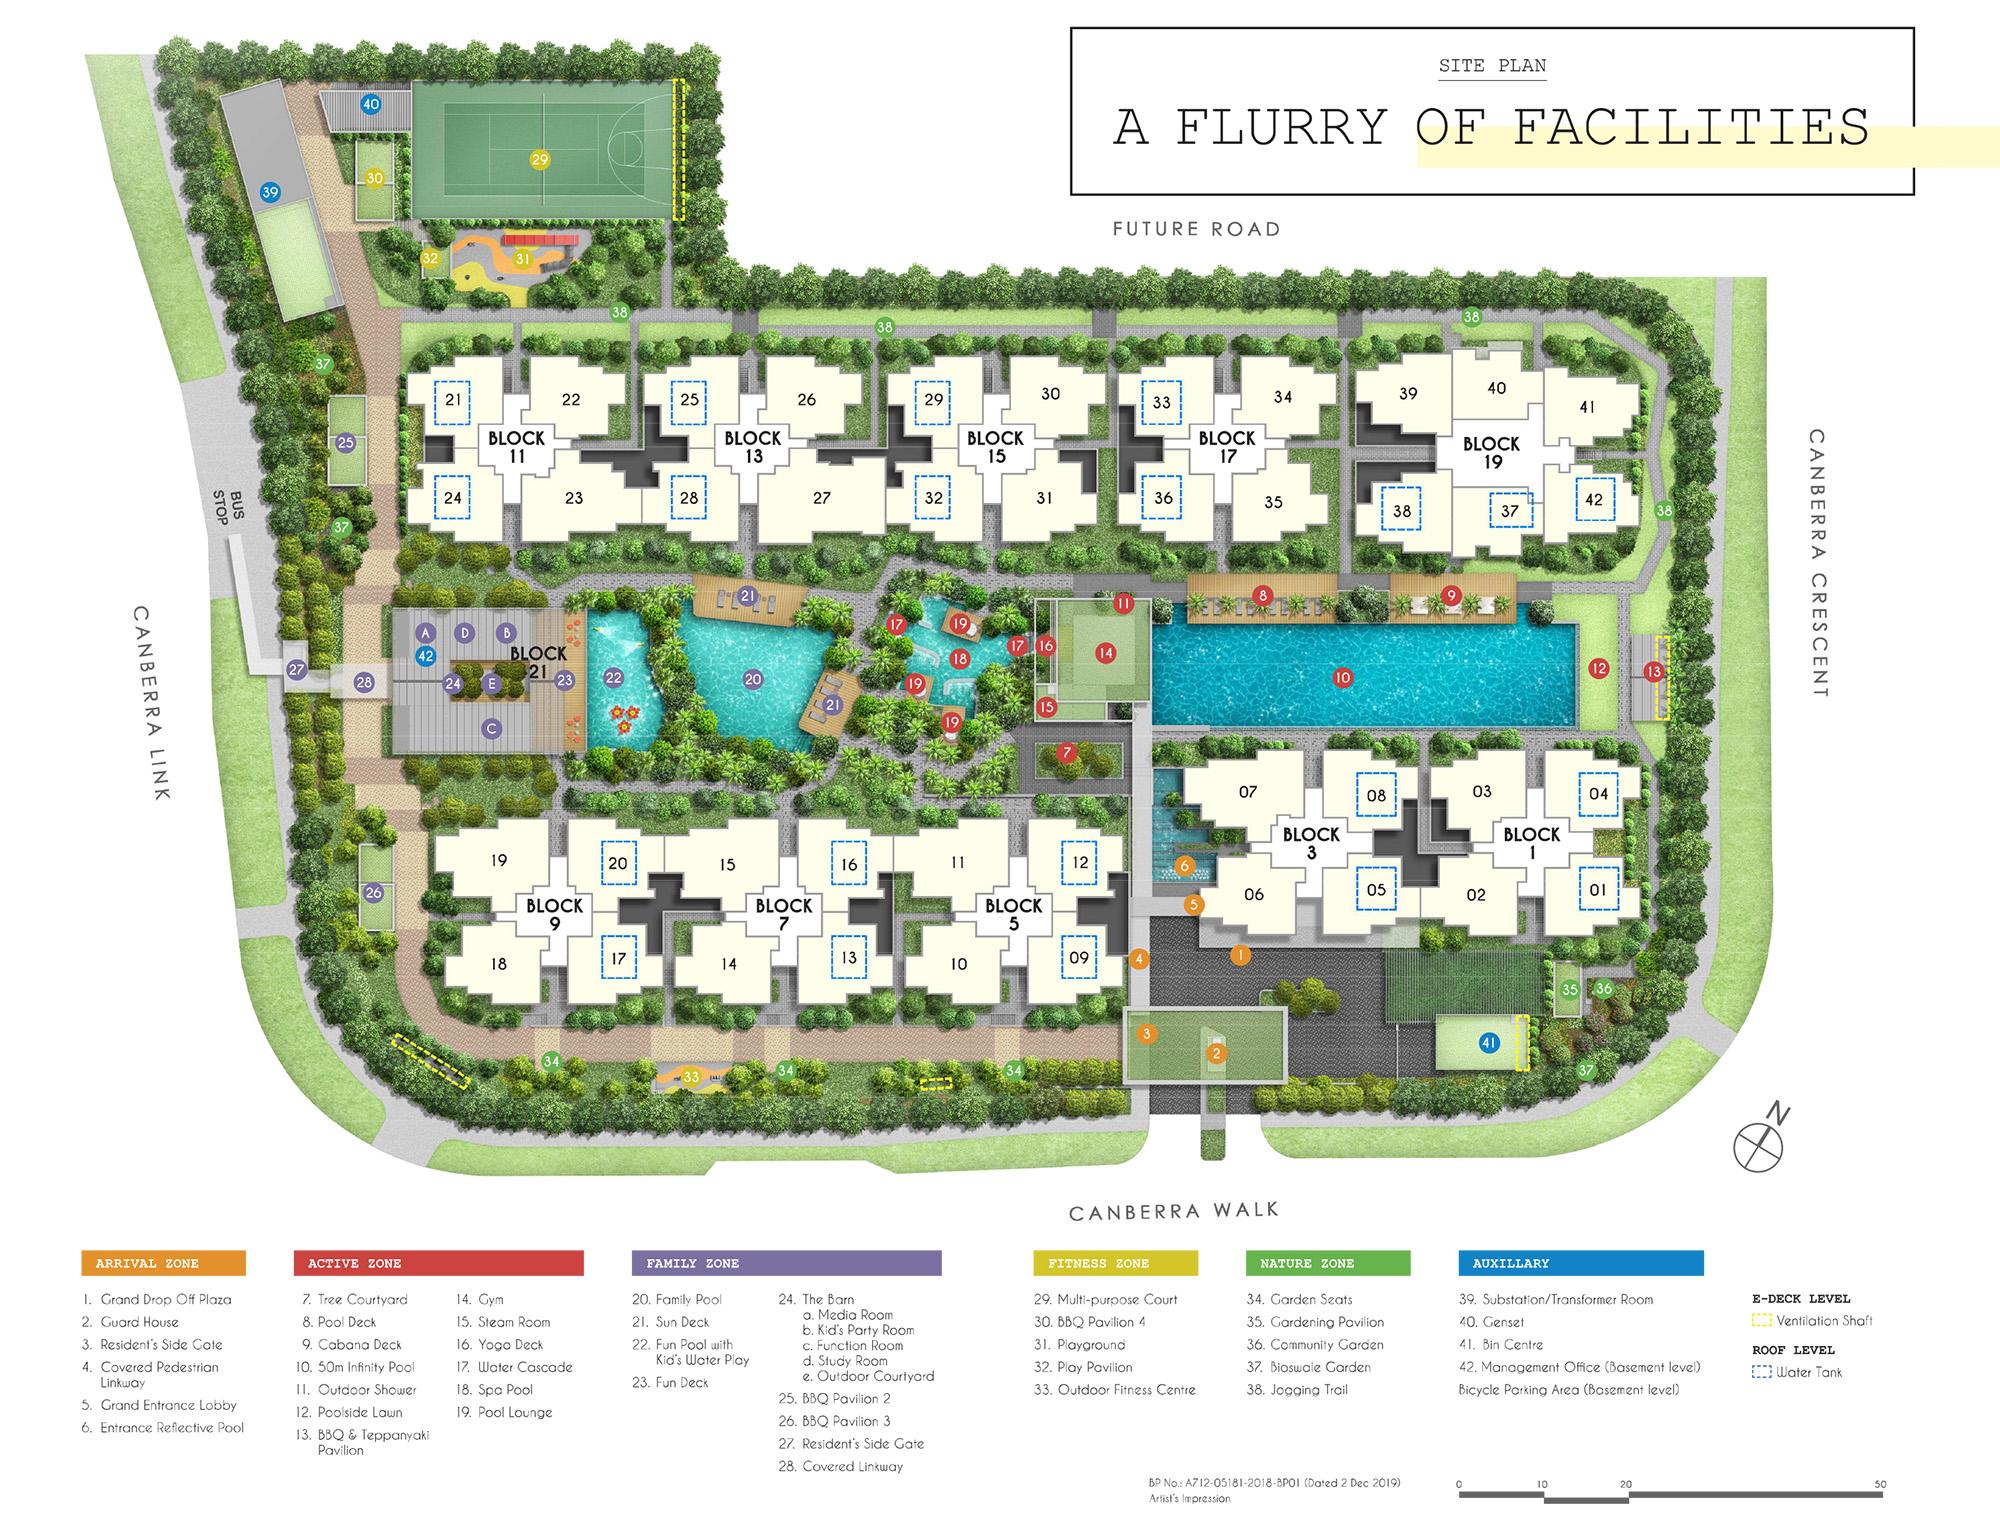 new-condo-singapore-parc-canberra-site-plan